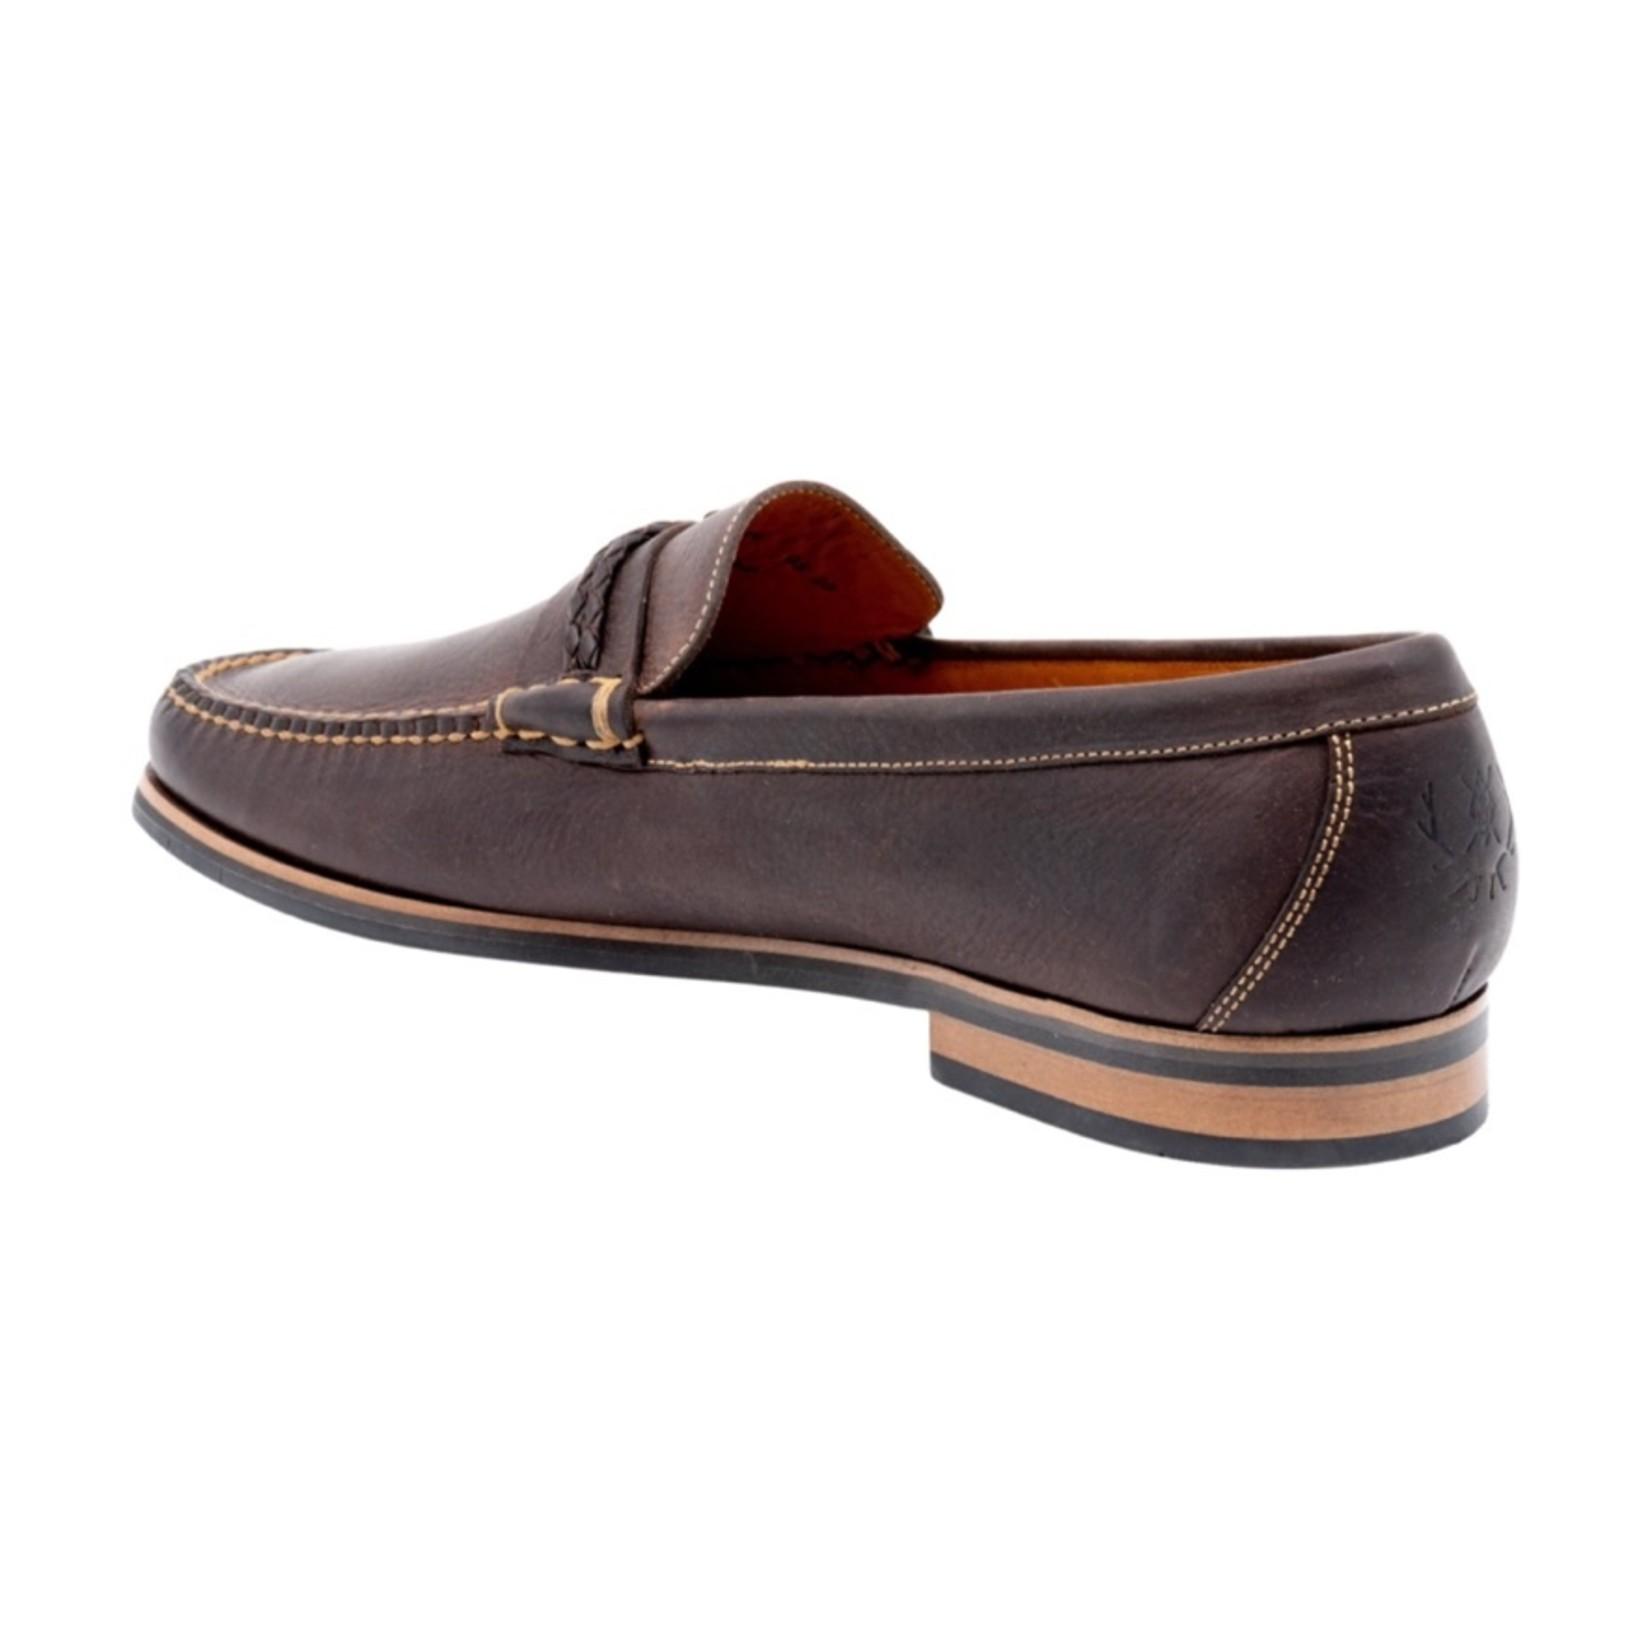 Martin Dingman Montgomery Oiled Saddle Leather Braided Leather Knot - Walnut